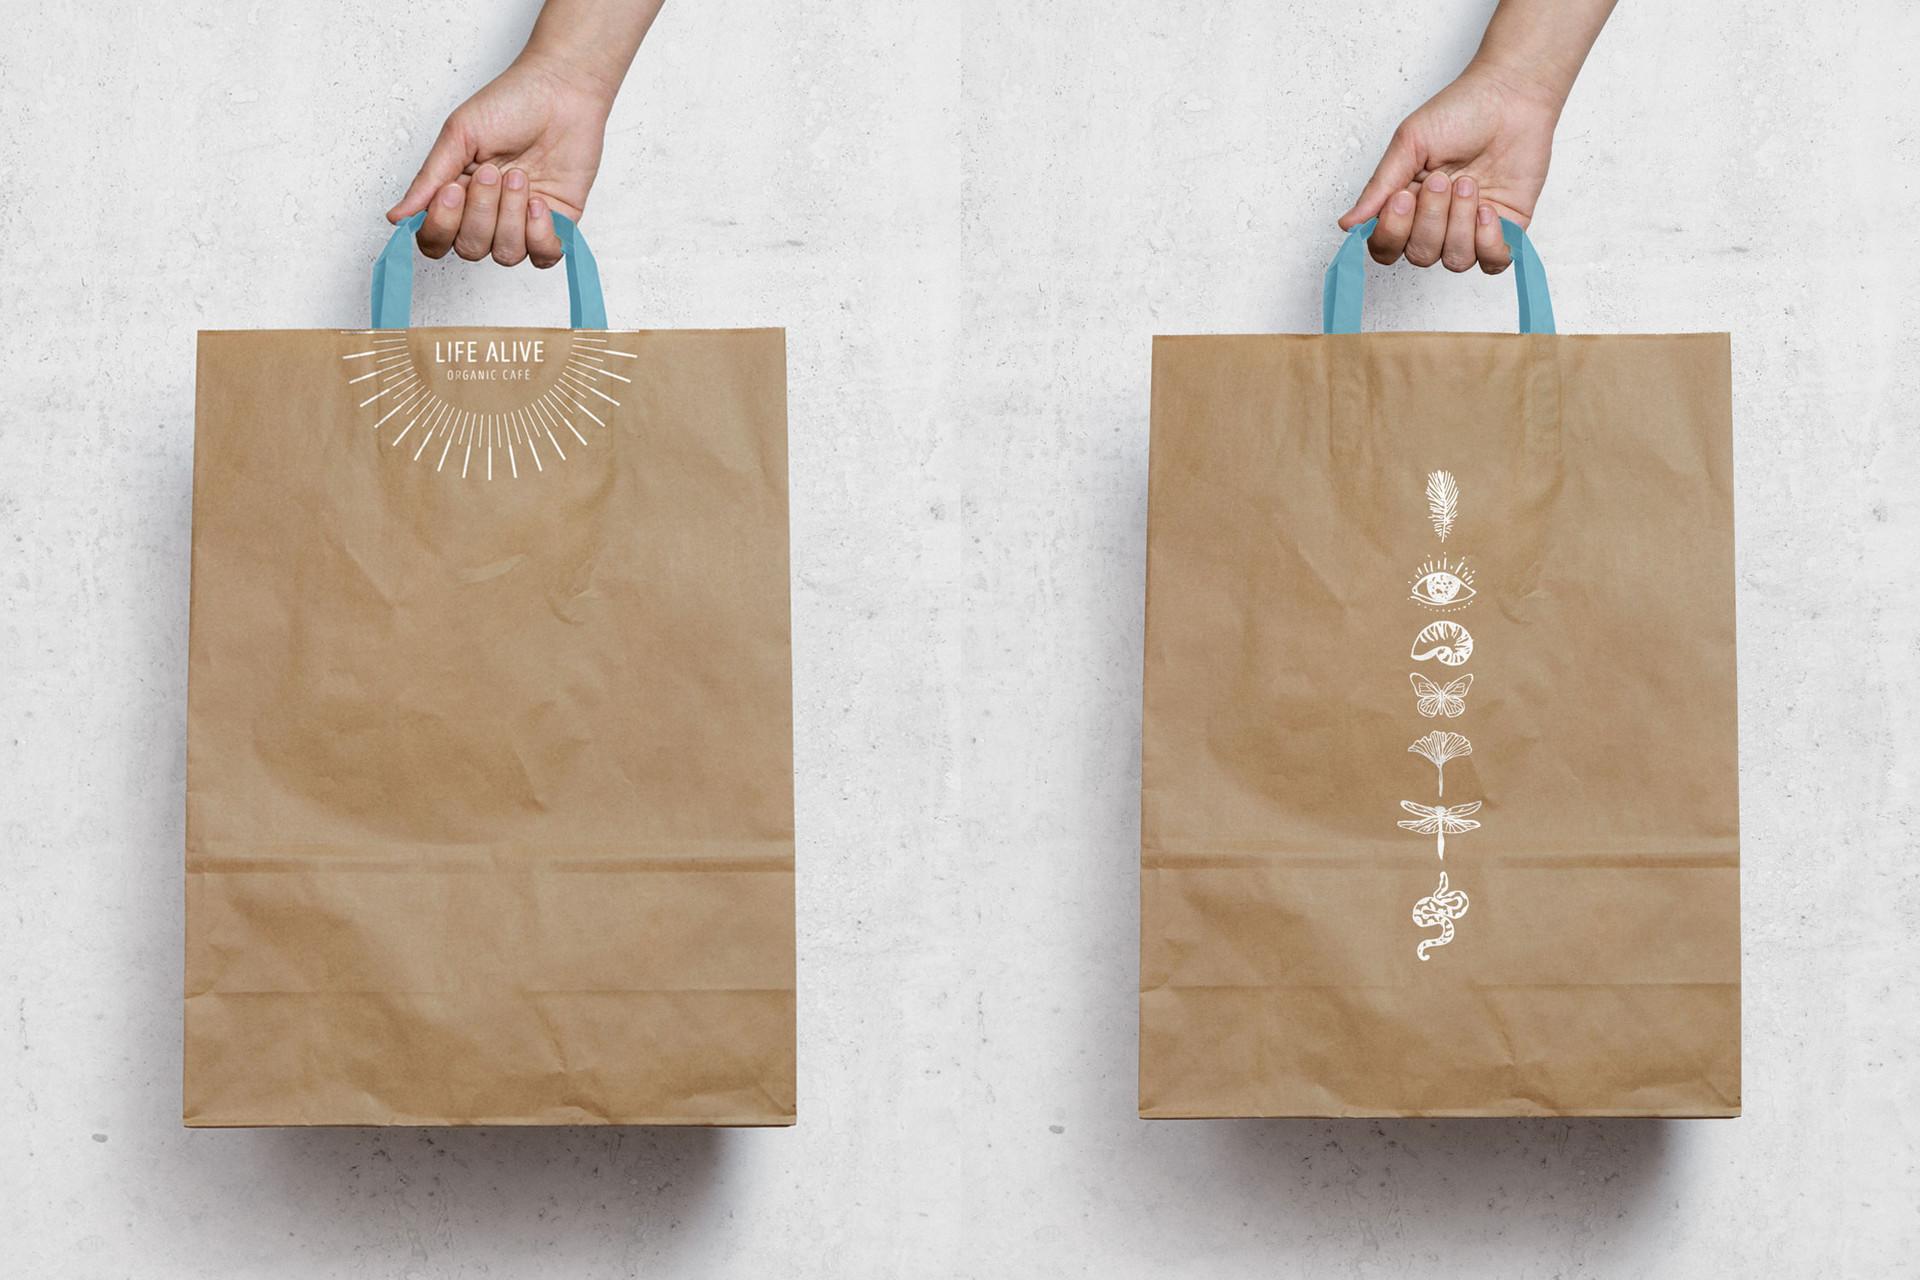 Horizontal-Life-Alive-Bags.jpg